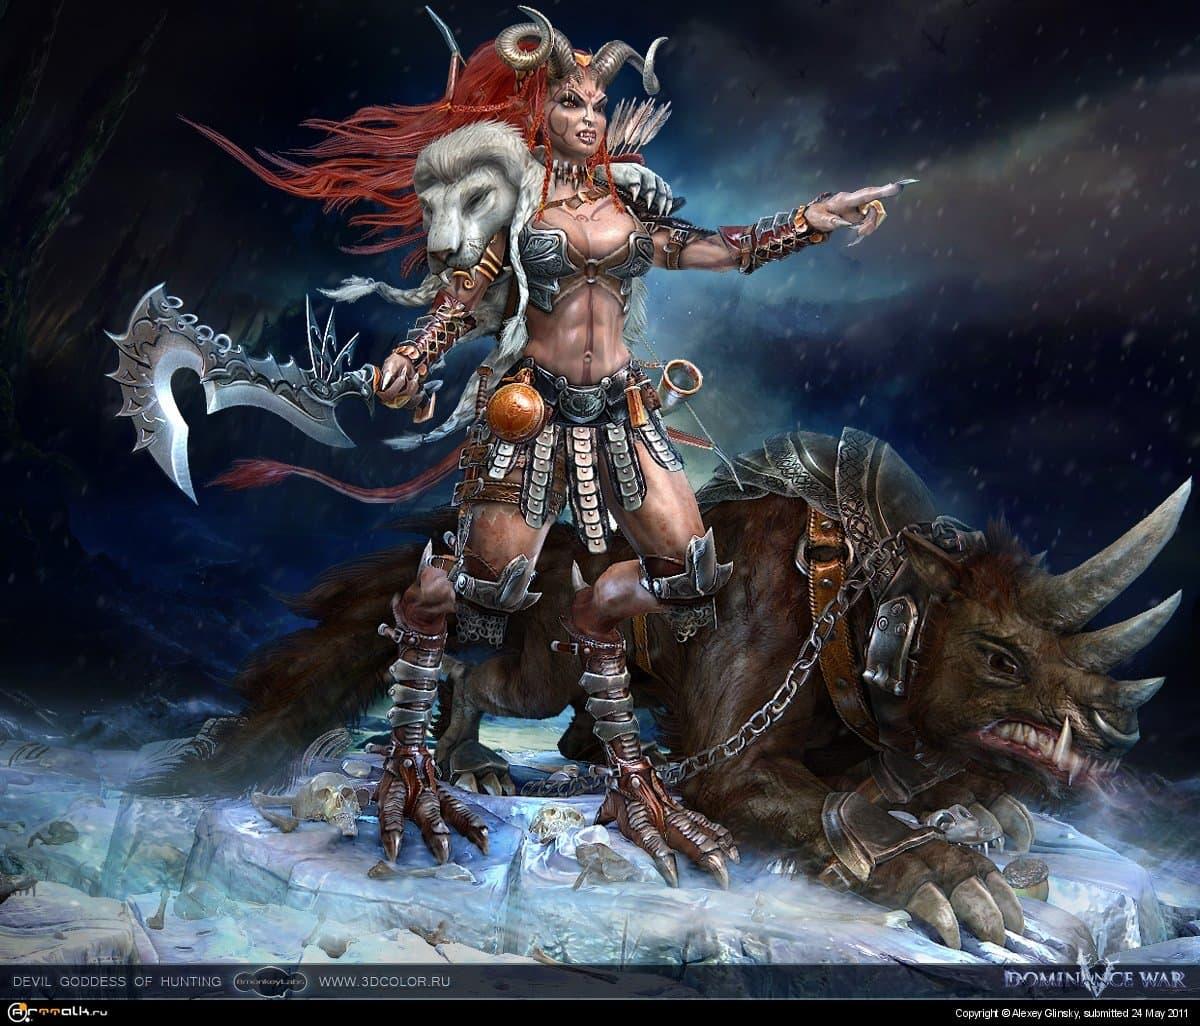 Dw5- Devil Goddess Of Hunting